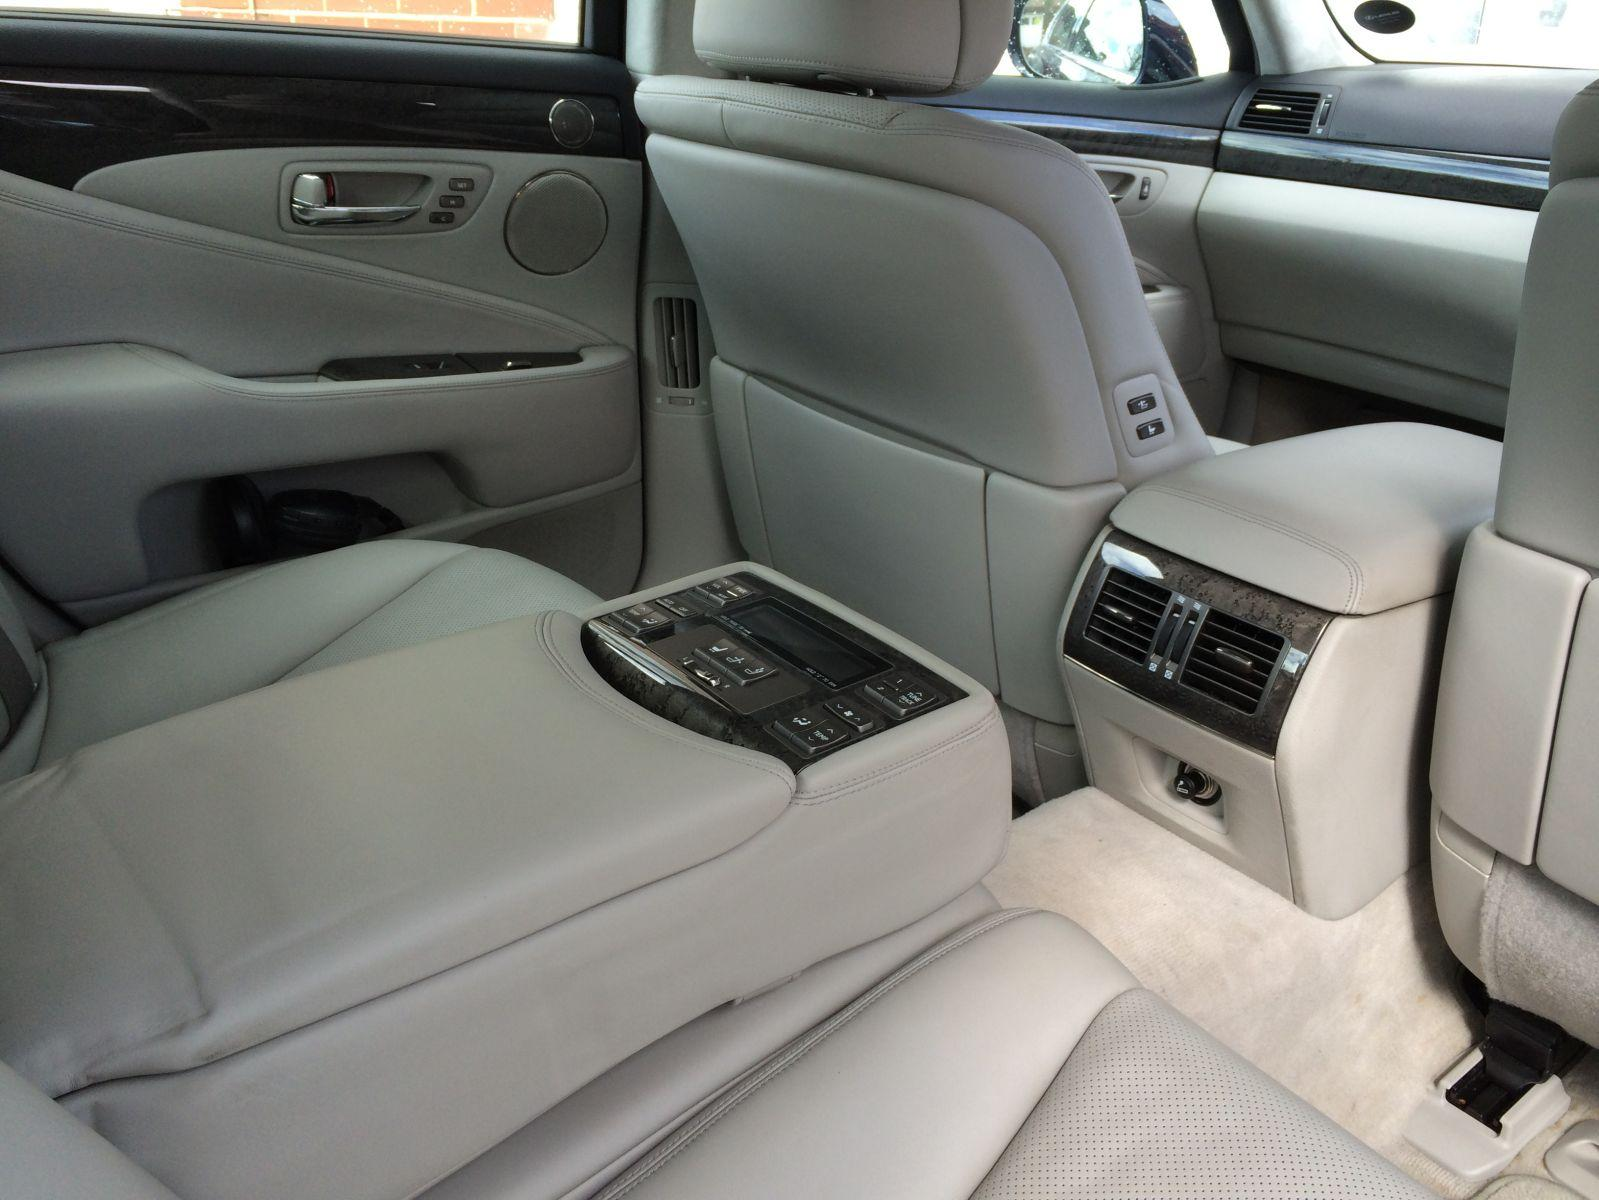 Rear seat controls